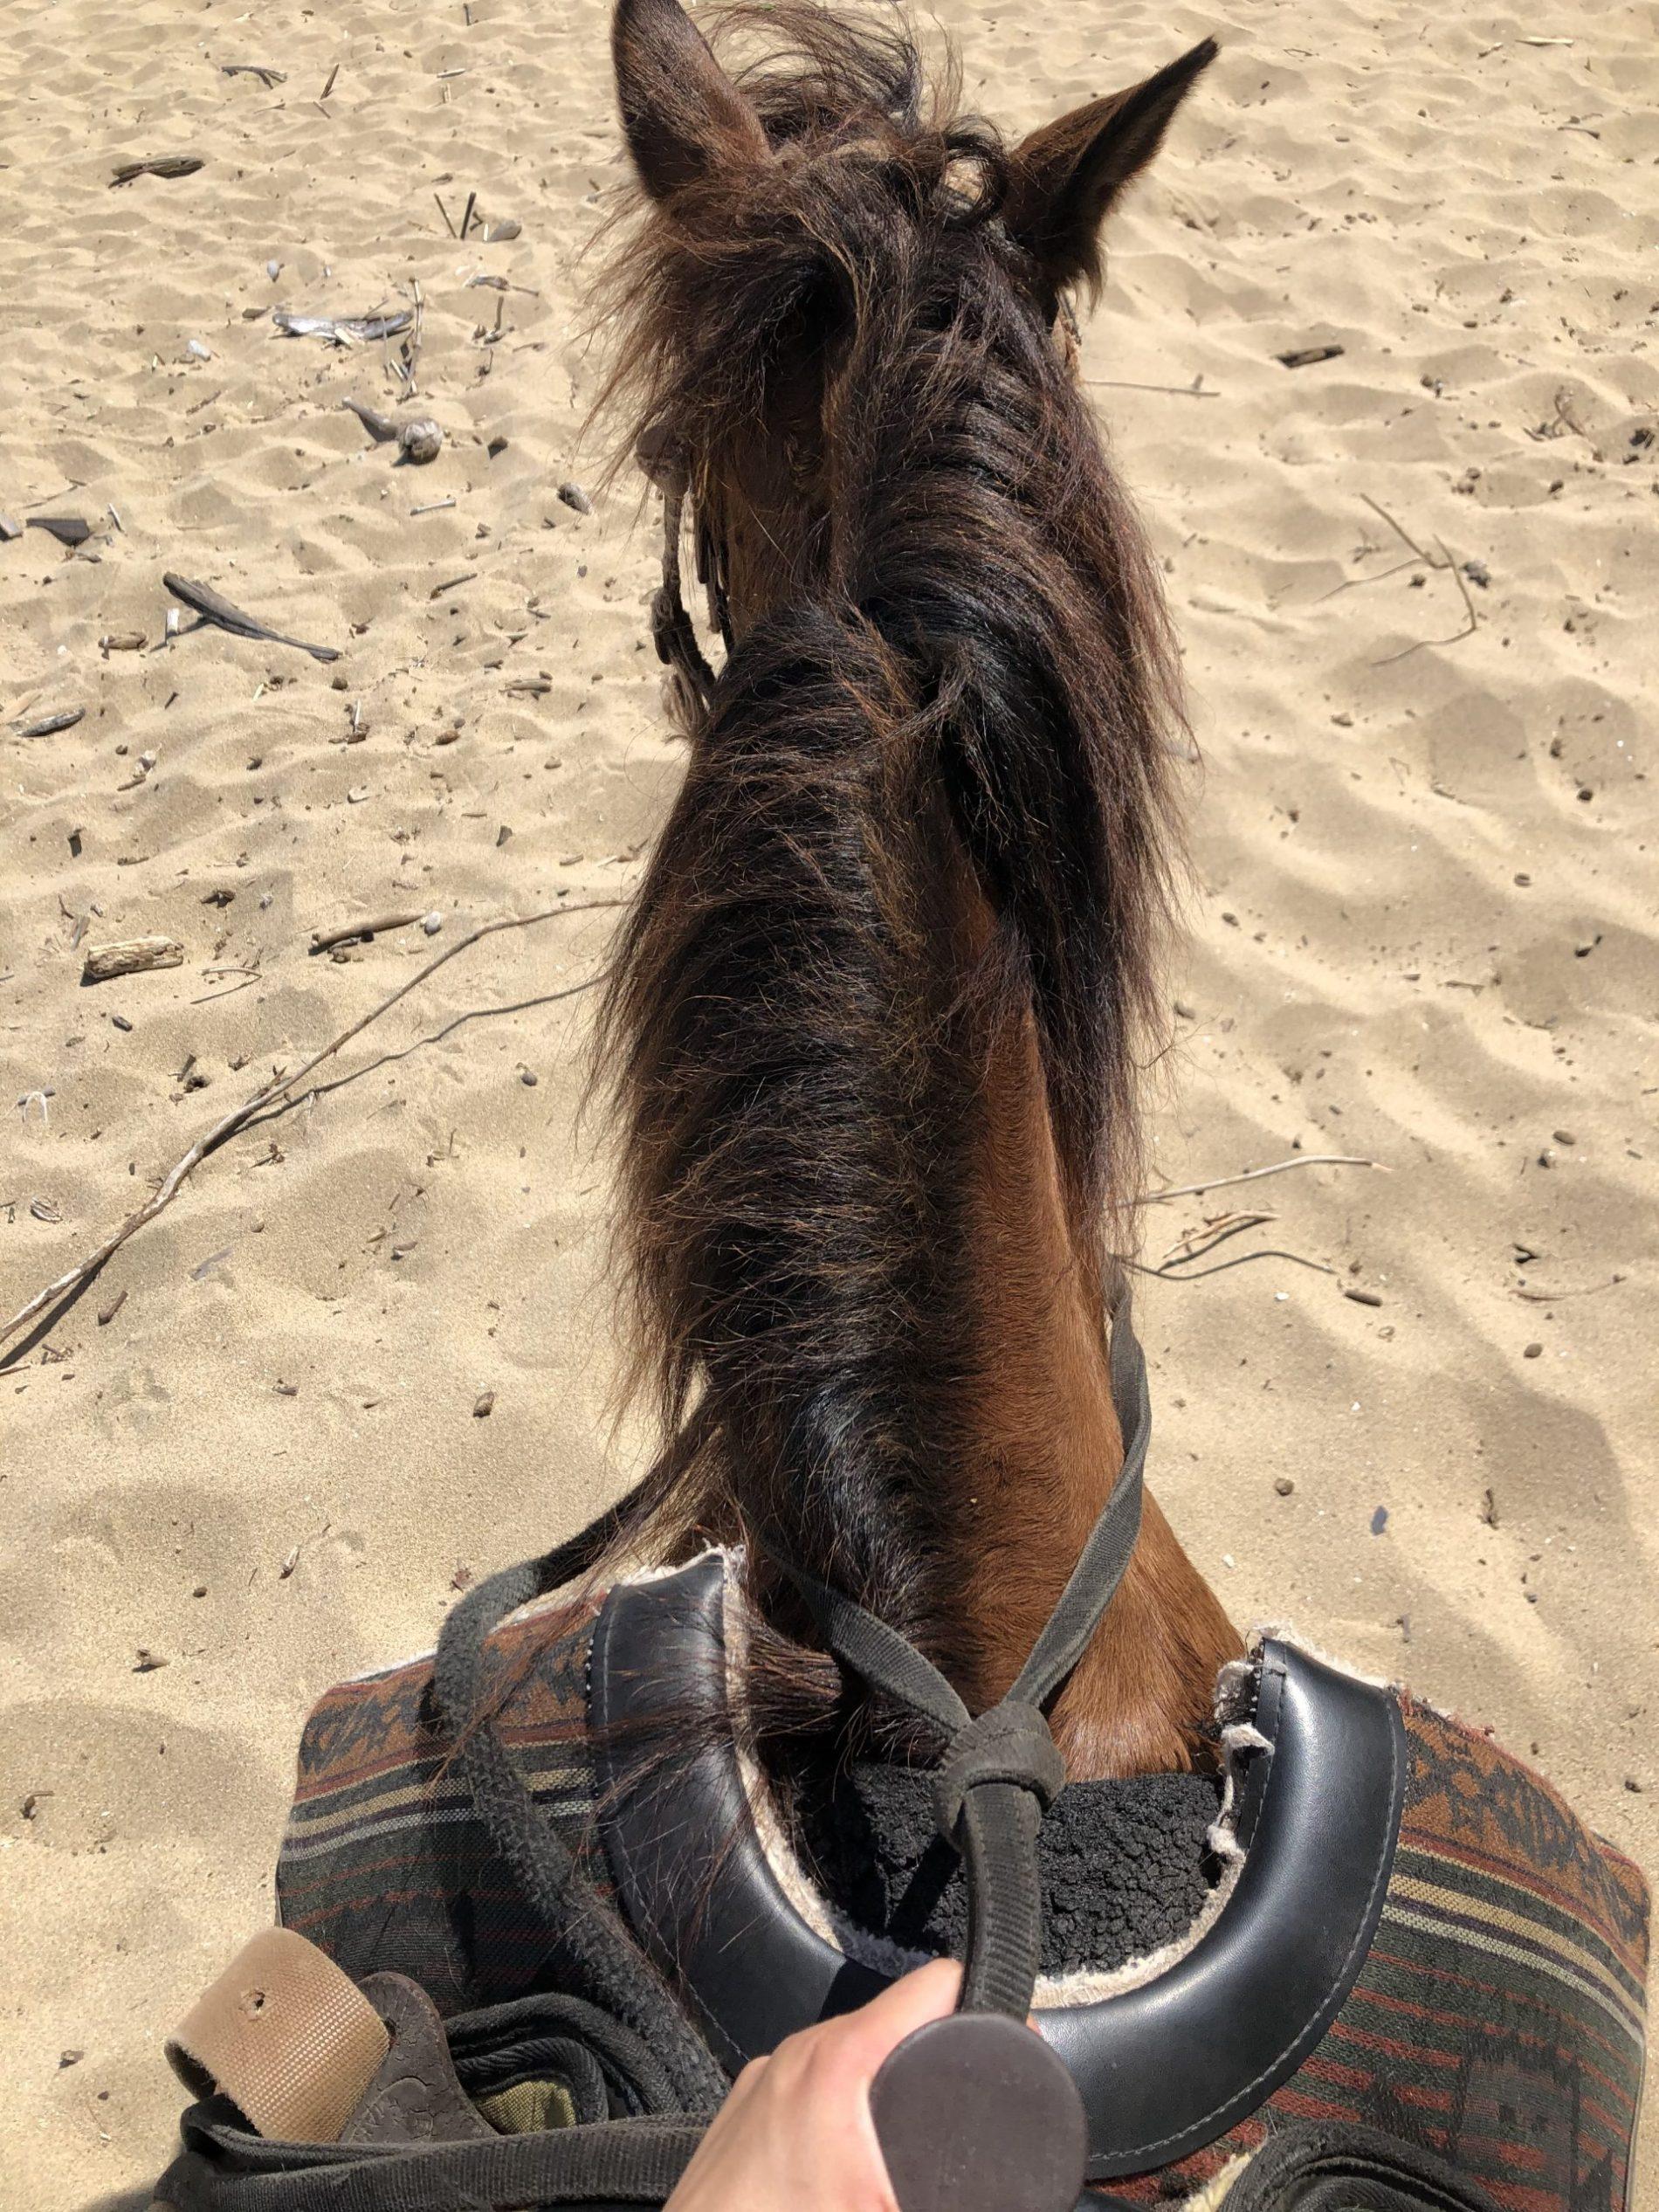 Tabitha on Peanut the horse in Puerto Rico